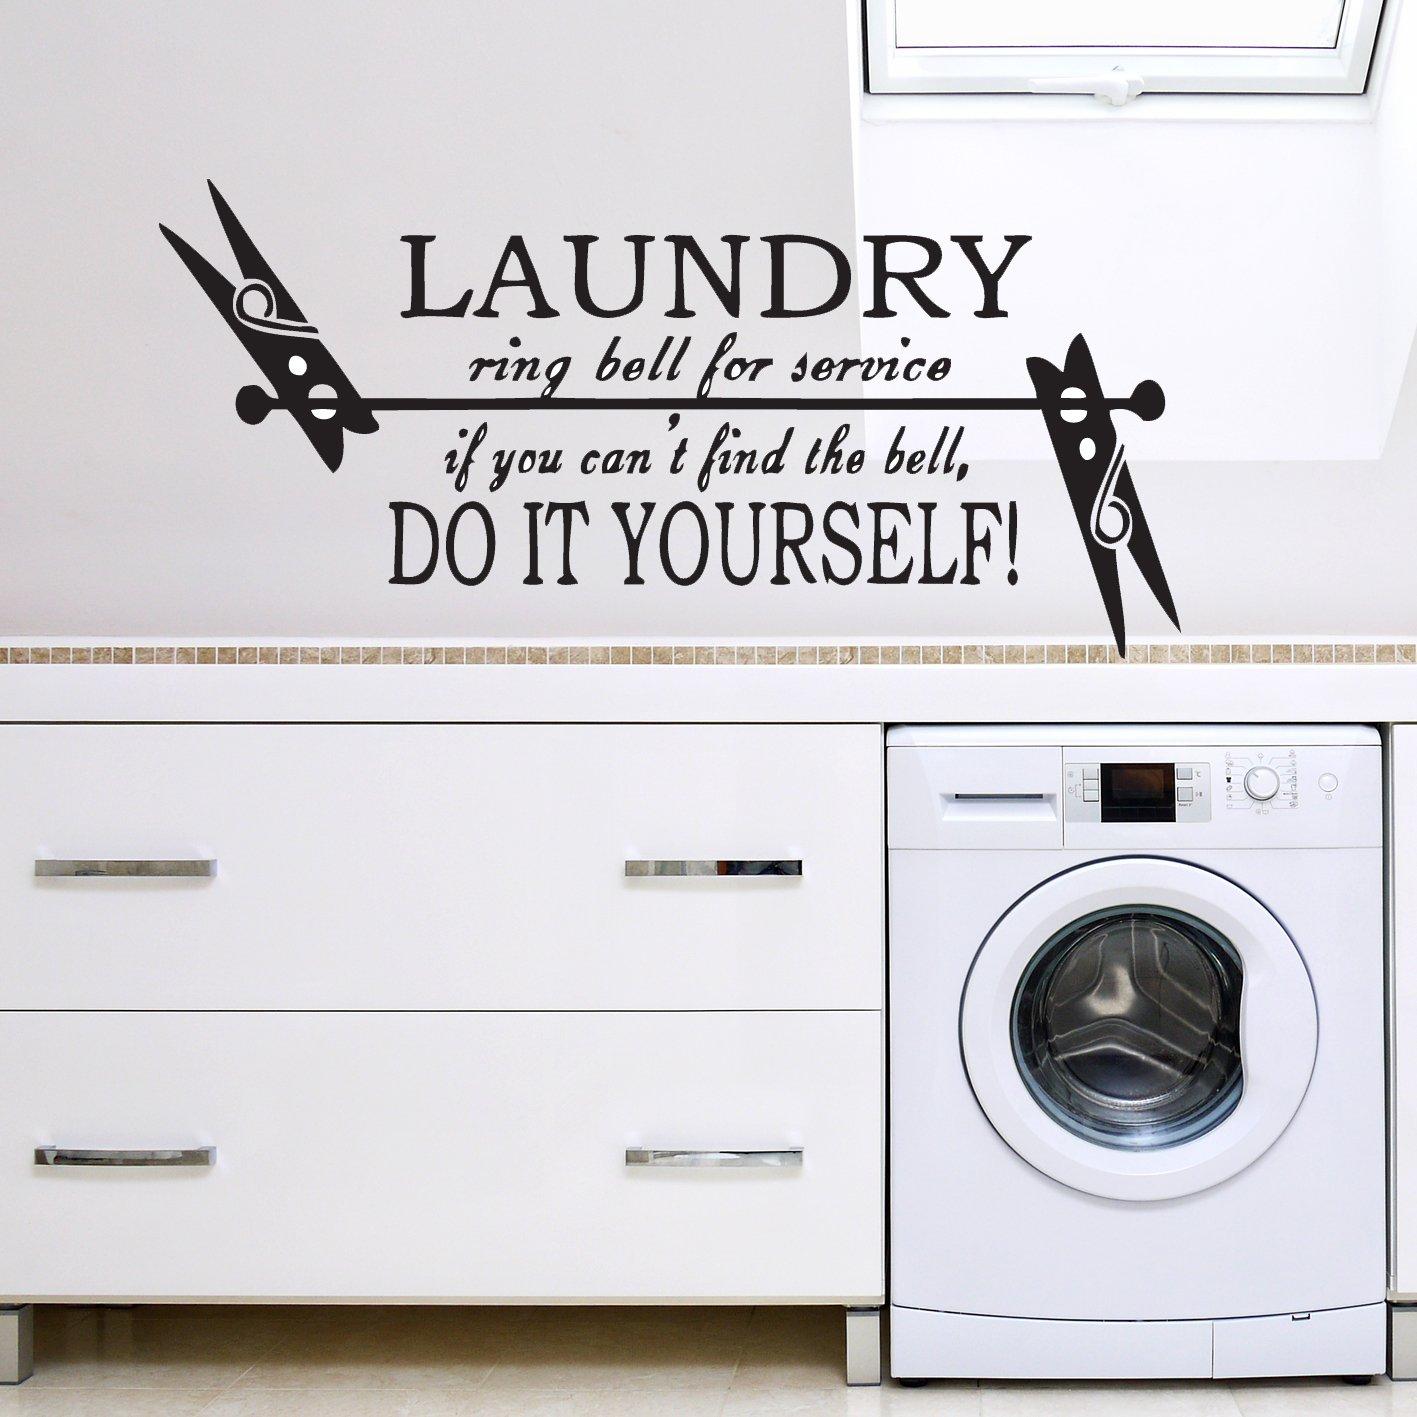 Vu0026C Designs Ltd (TM) Laundry Room Self Service Kitchen Or Utilities Wall  Sticker Wall Decal Wall Art Vinyl Wall Mural: Amazon.co.uk: Kitchen U0026 Home